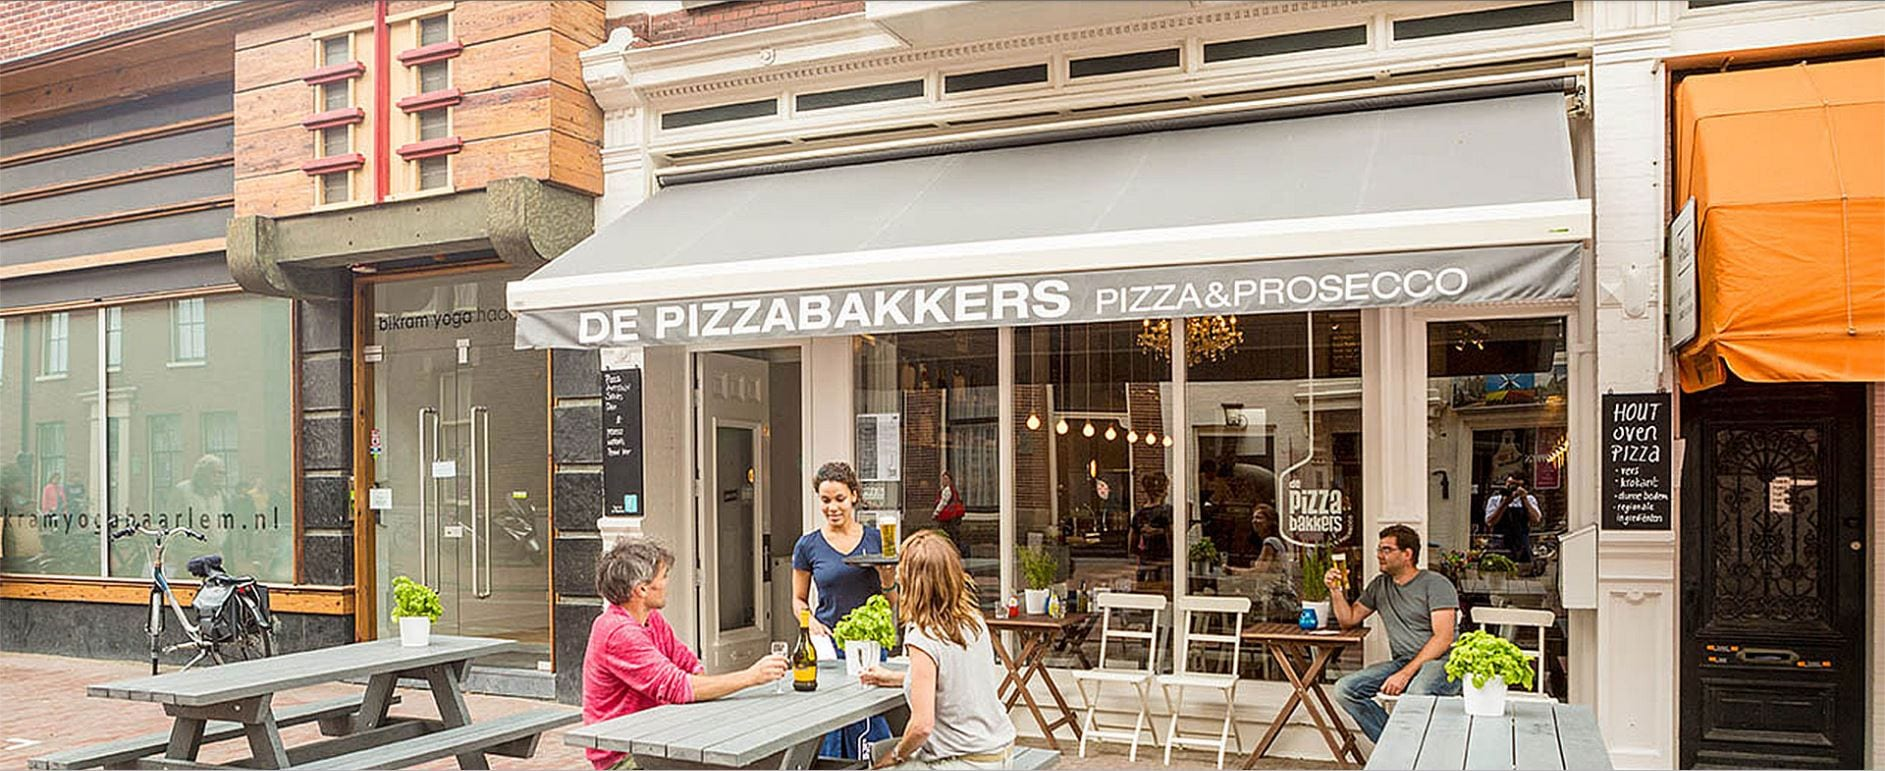 De Pizzabakkers - pizza en prosecco